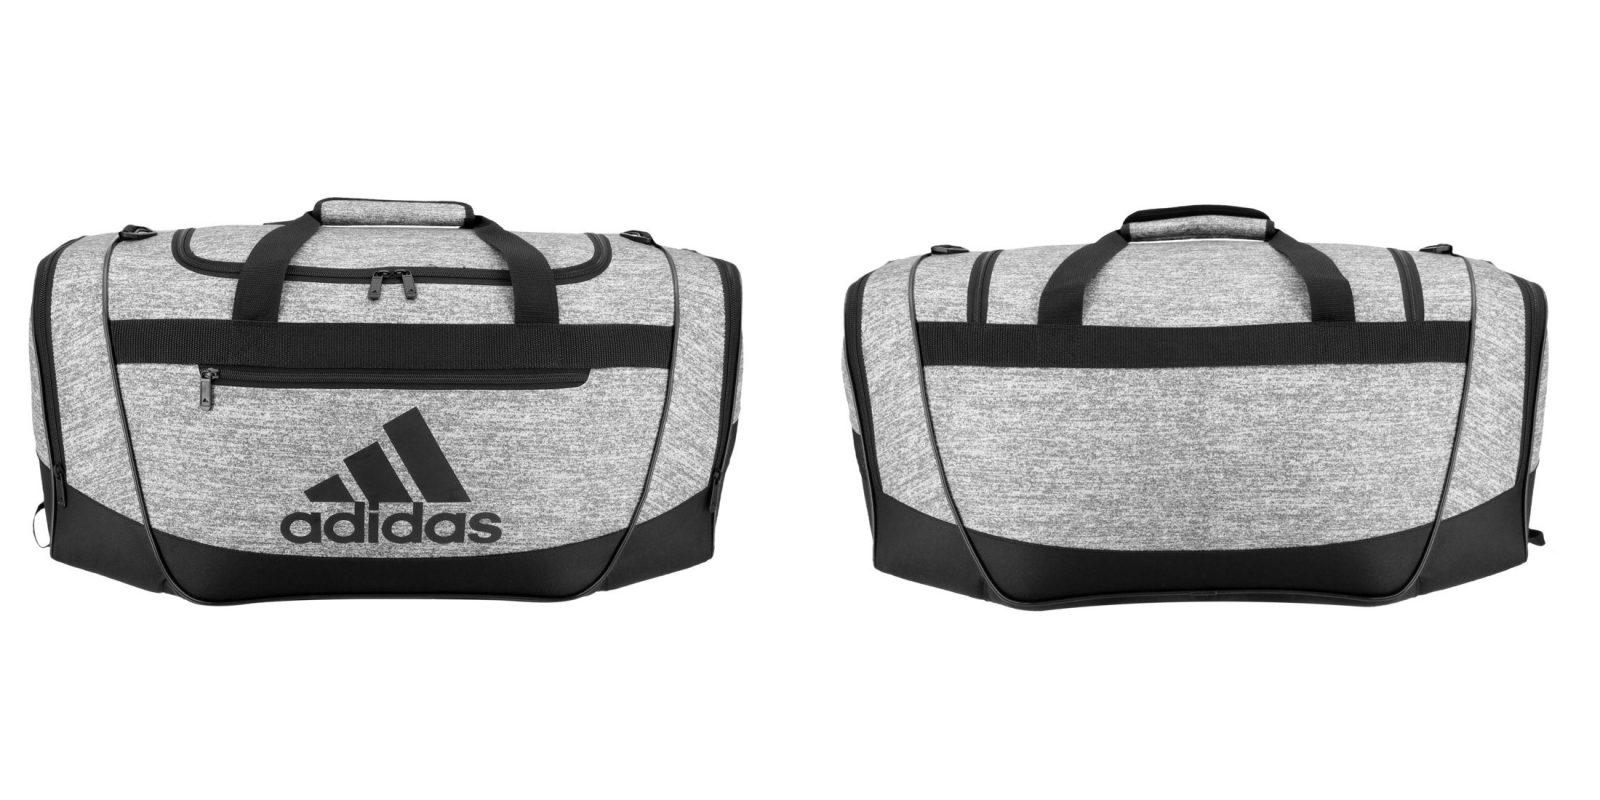 4a49361b6 Make this $19.50 adidas Defender III Medium Duffel your brand new gym bag